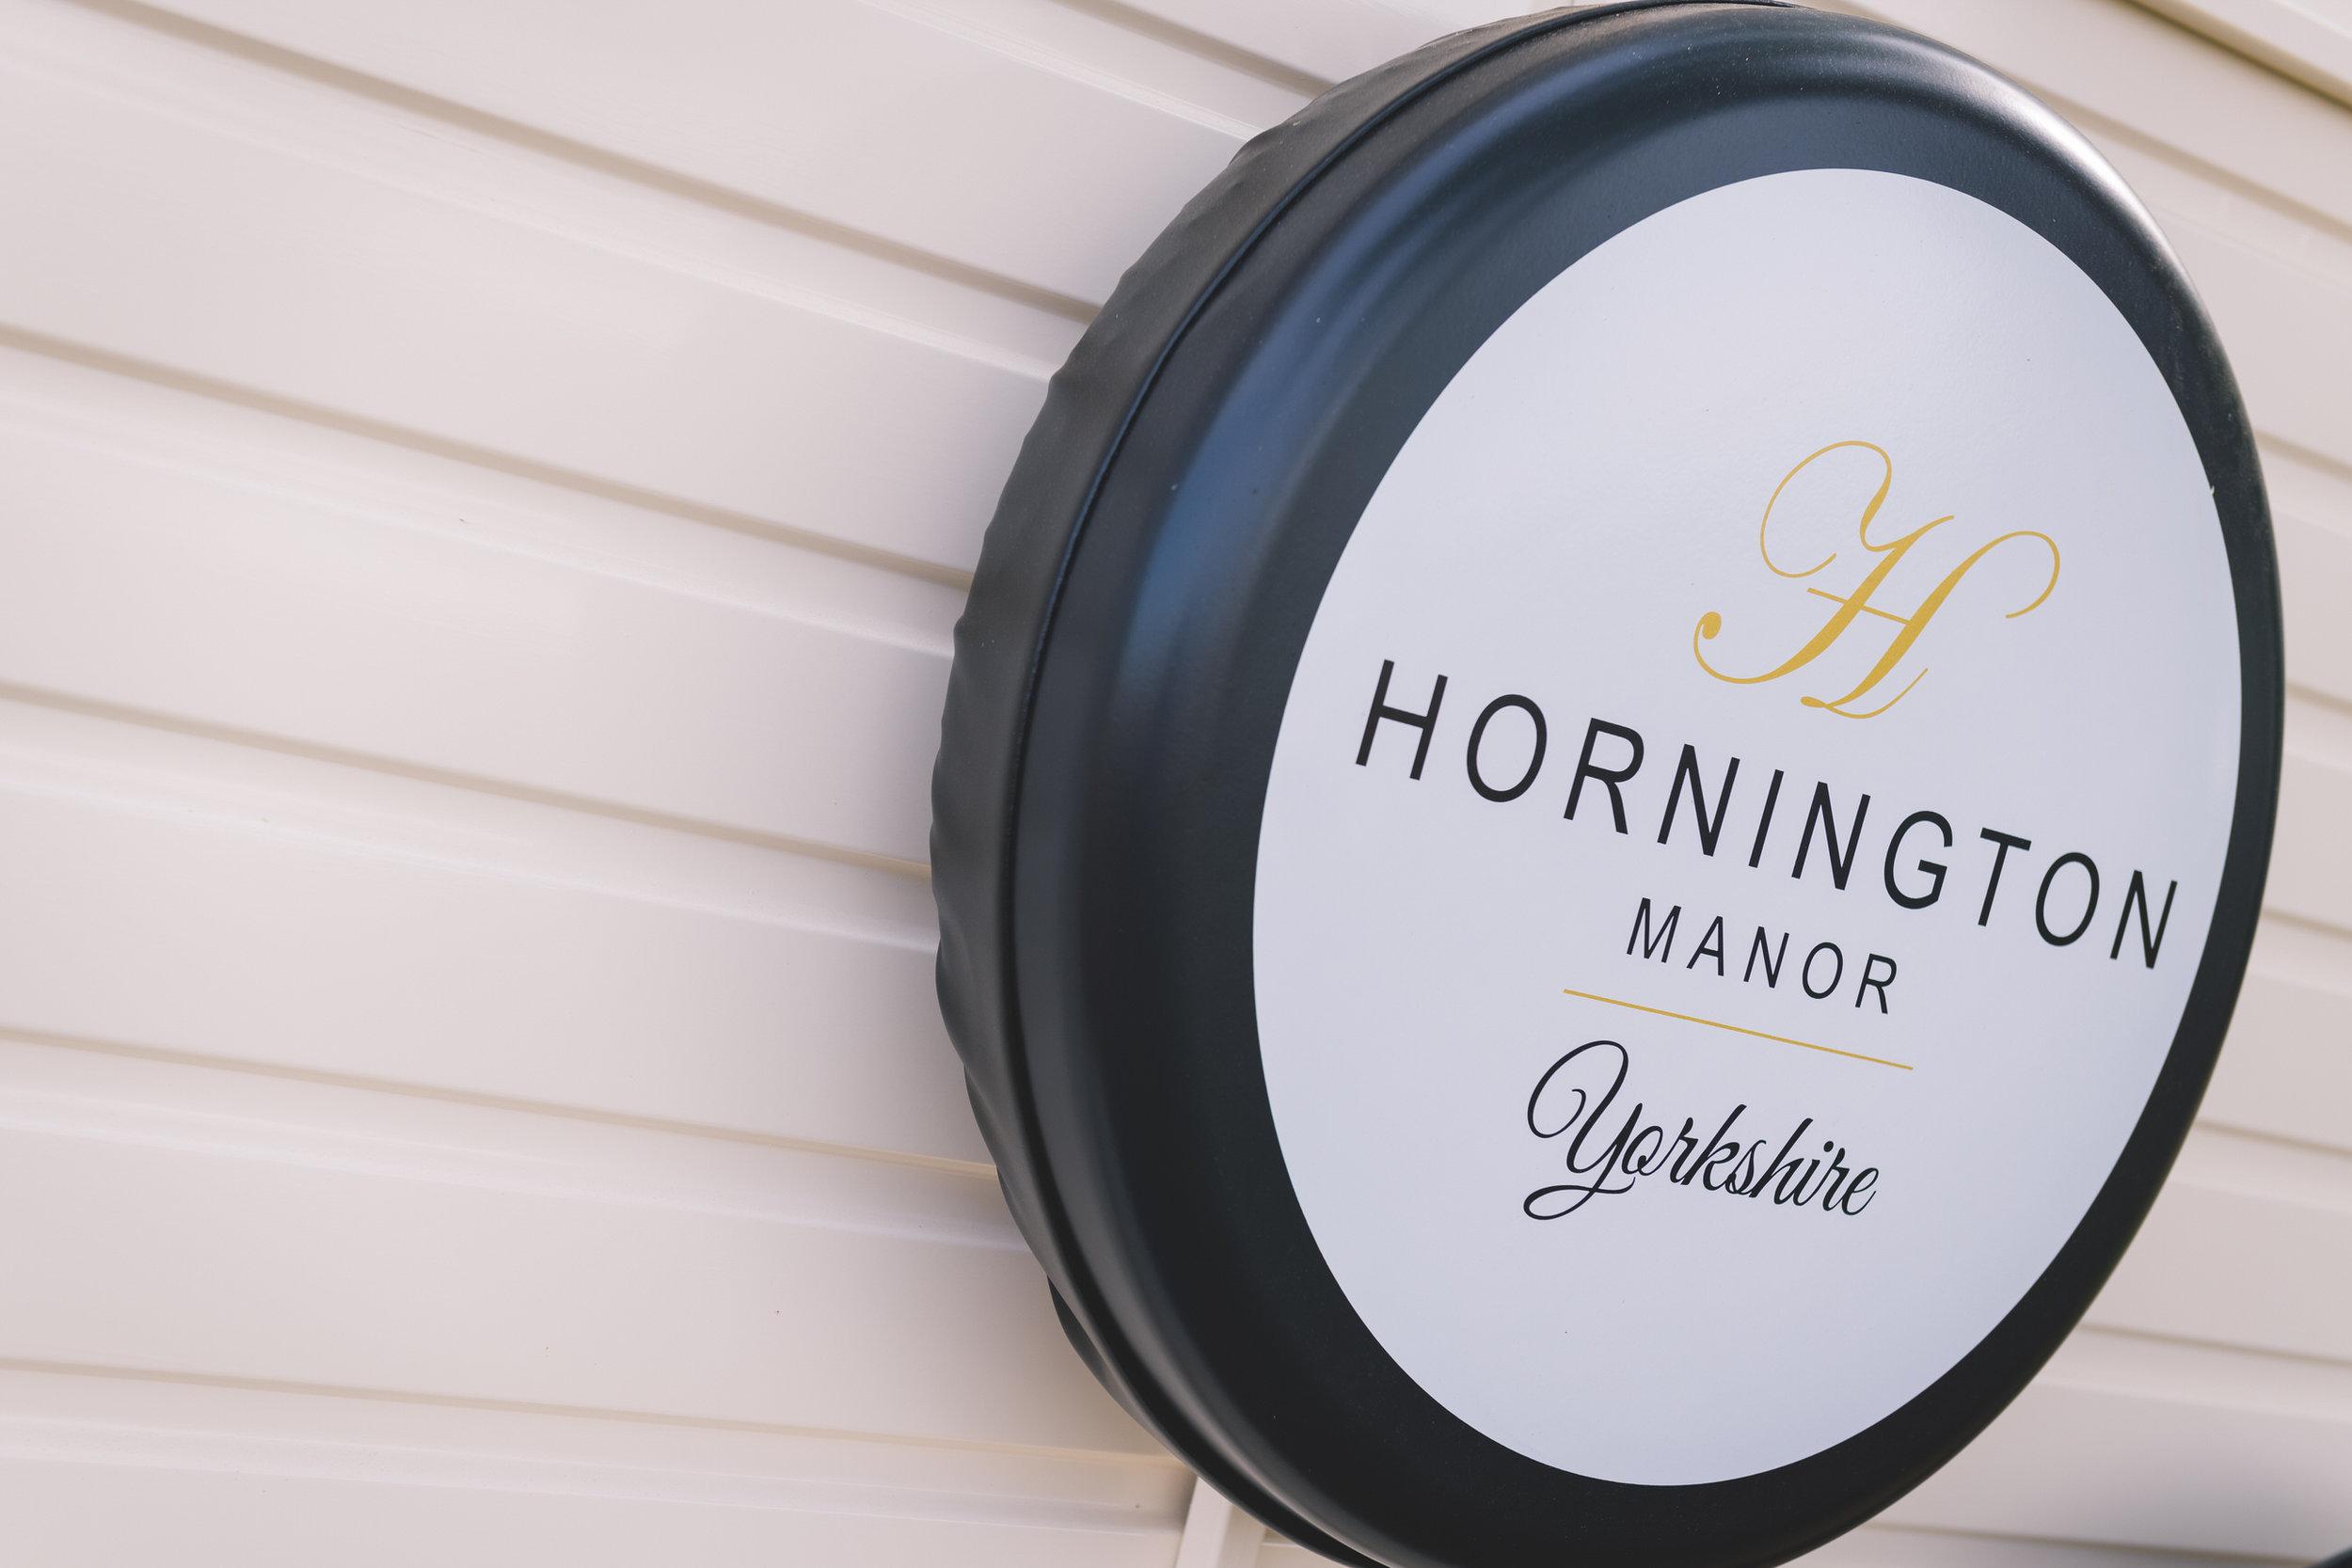 hornington-manor-yorkshire-wedding-photographer-4.jpg